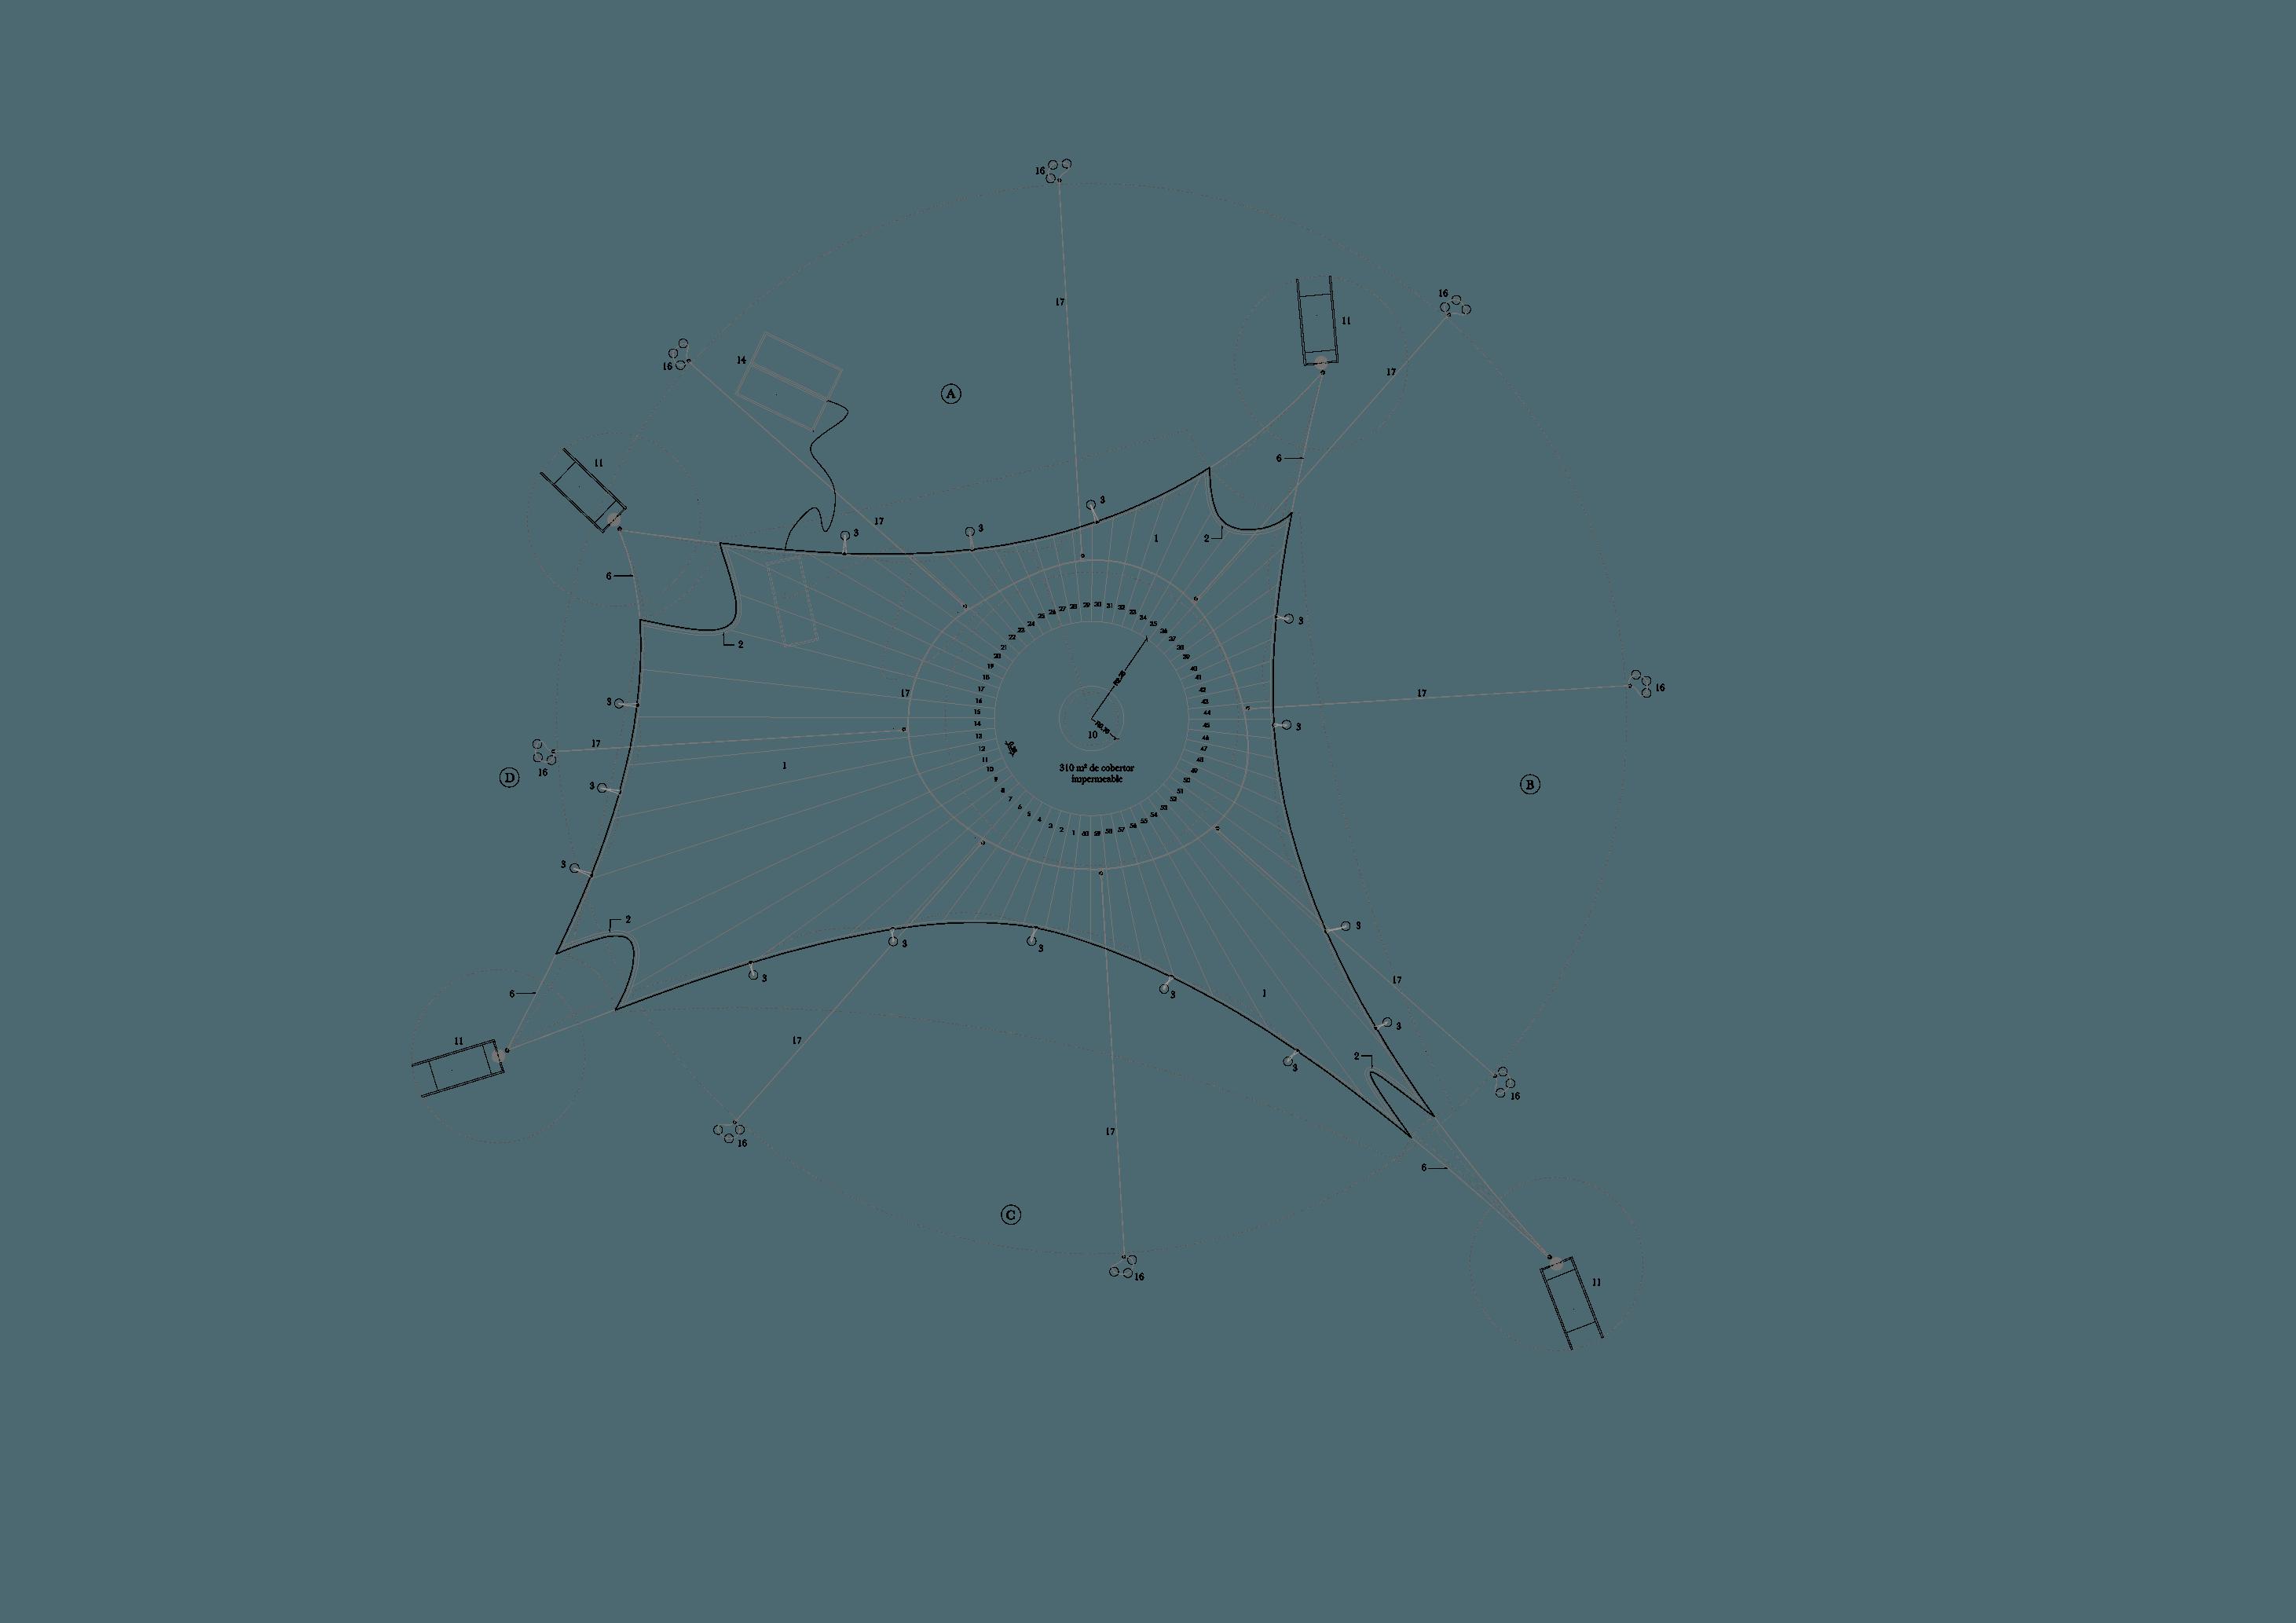 ga-estudio-pabello-de-helio-planta-emergencia